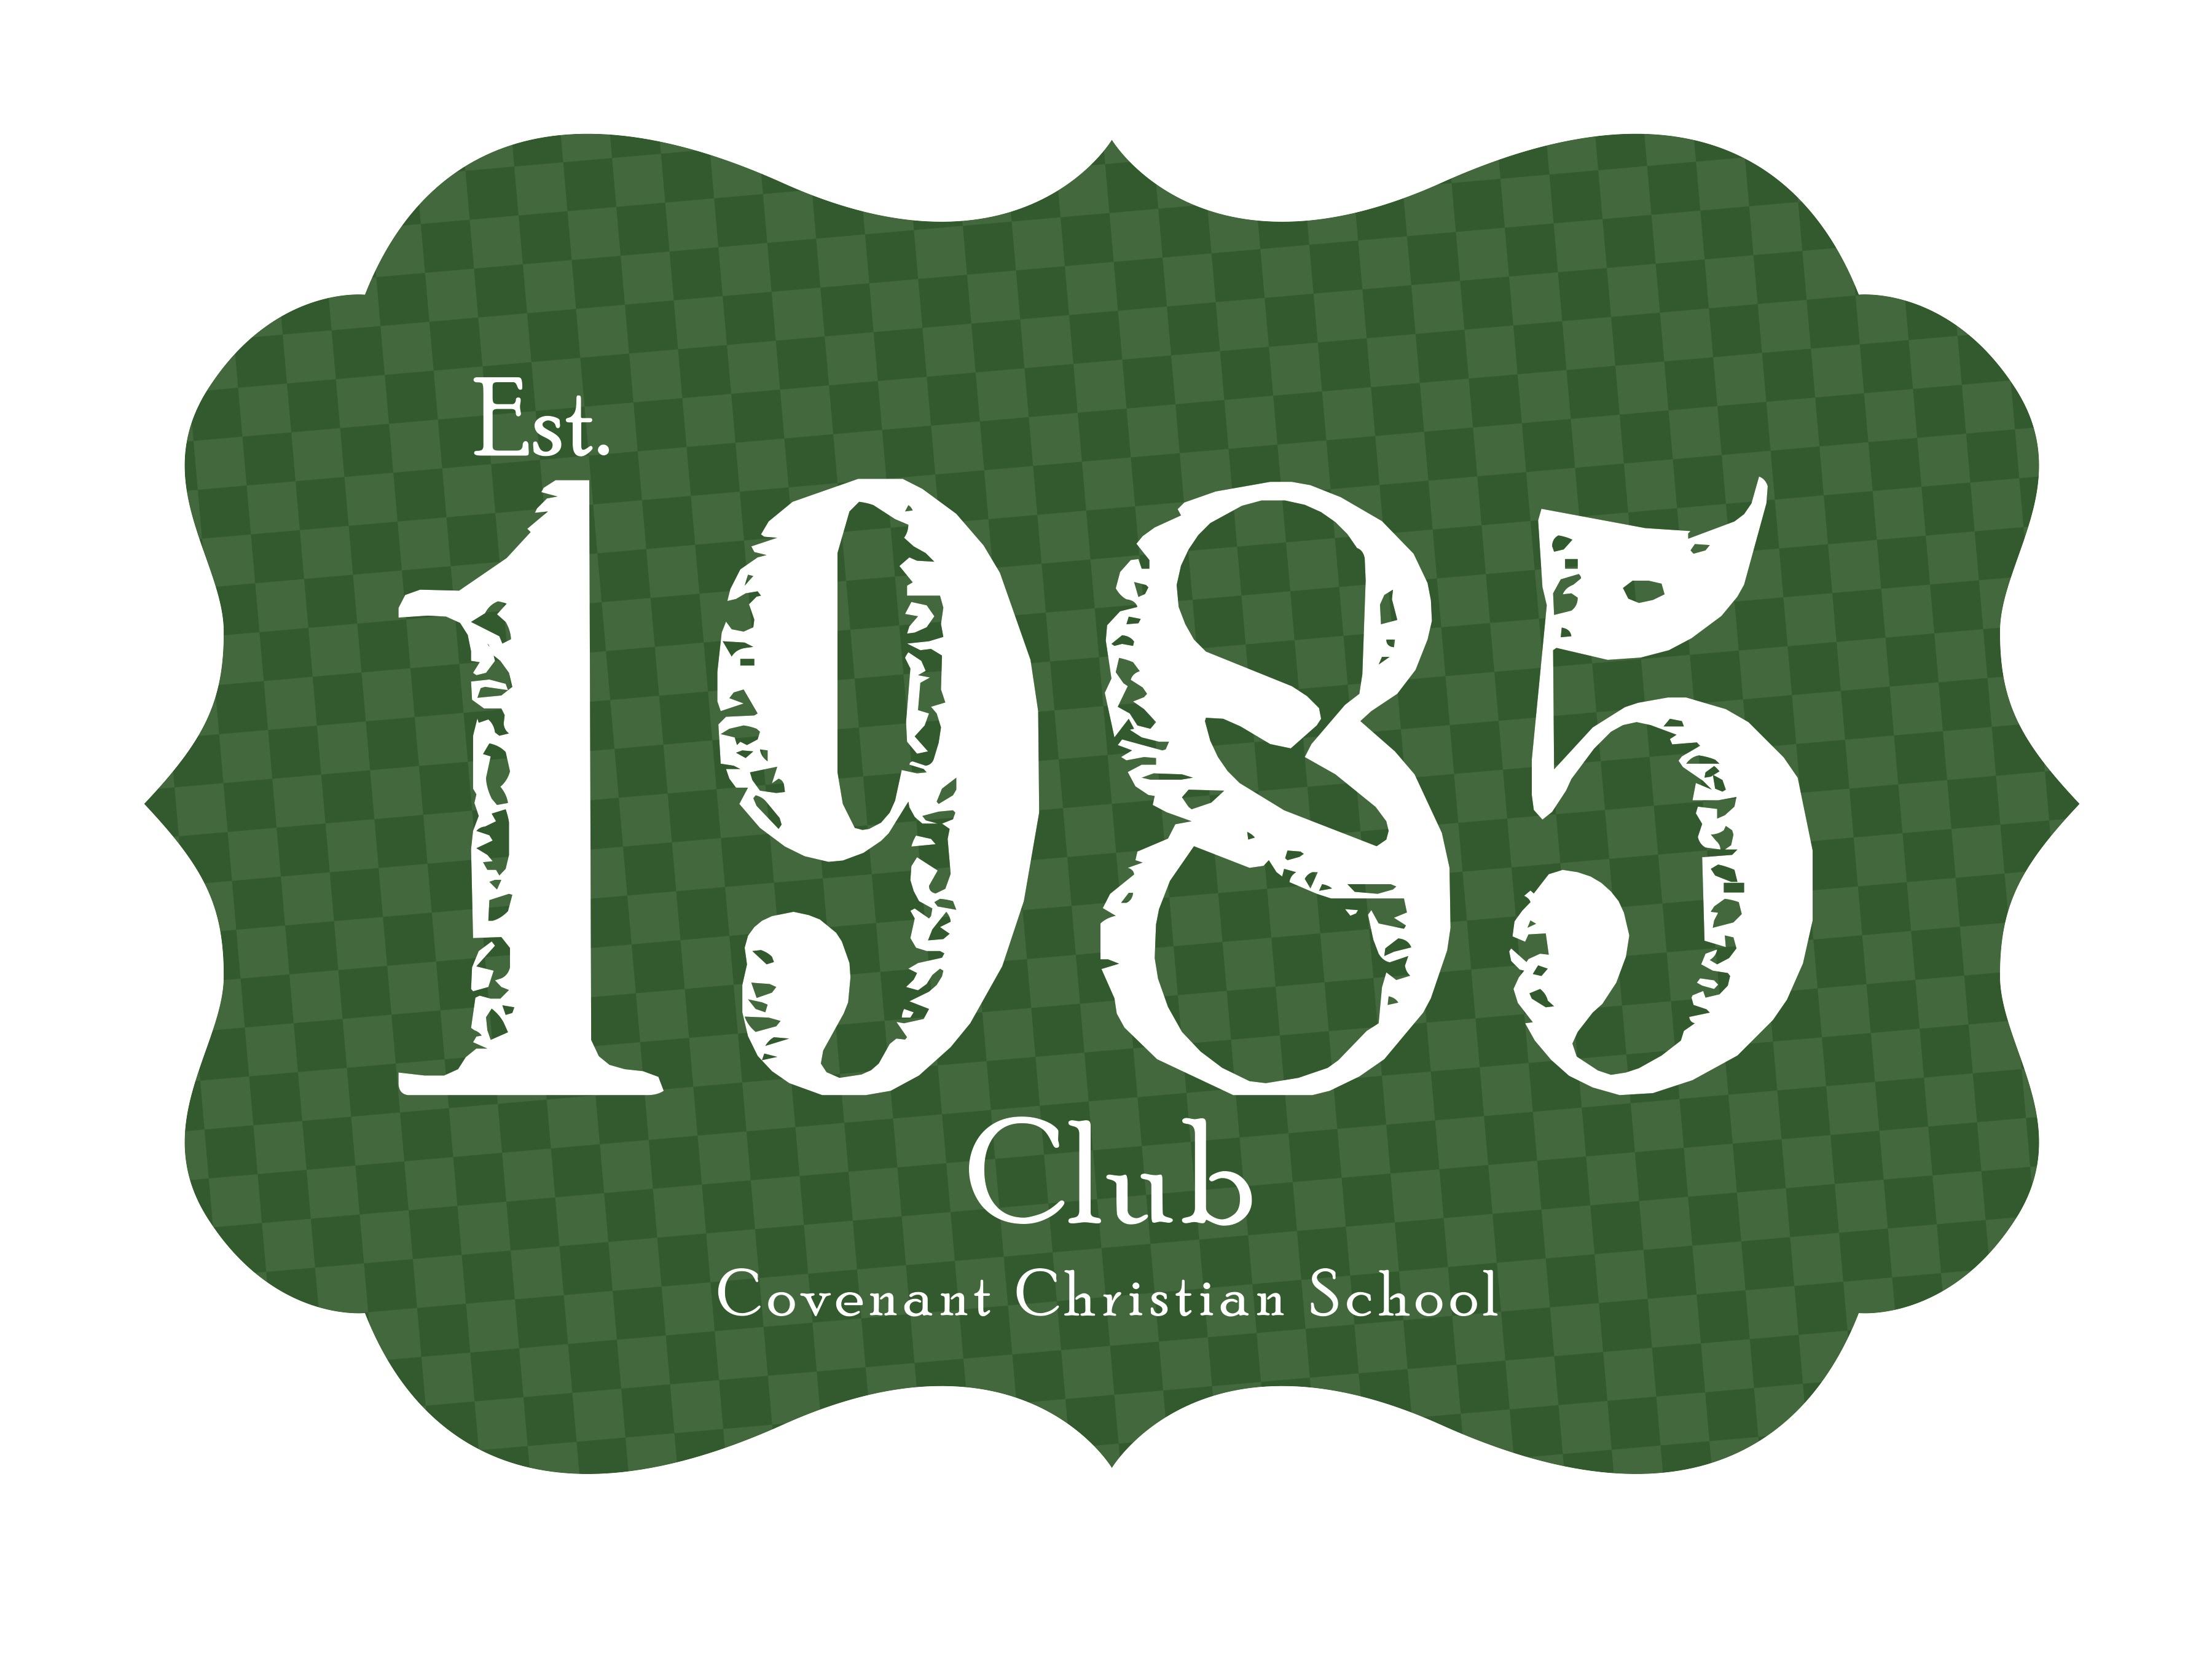 The 1985 Club Covenant Christian School